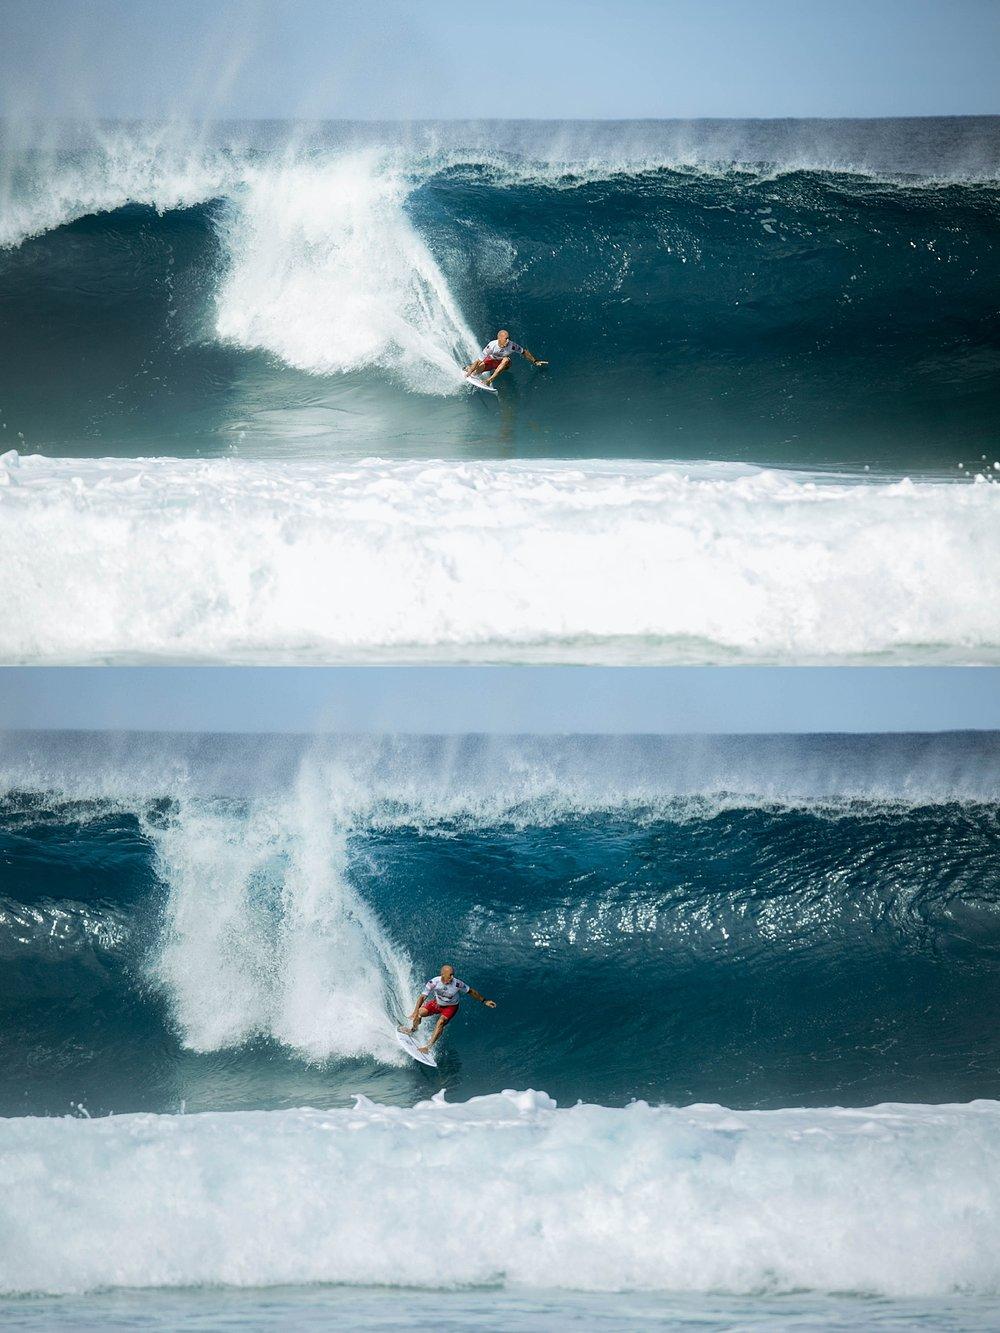 Travel Surf and Travel Lifestyle Photographer Kelee Bovelle @keleeb - Billabong Pipe Masters 2018 North Shore Oahu Hawaii_0016.jpg